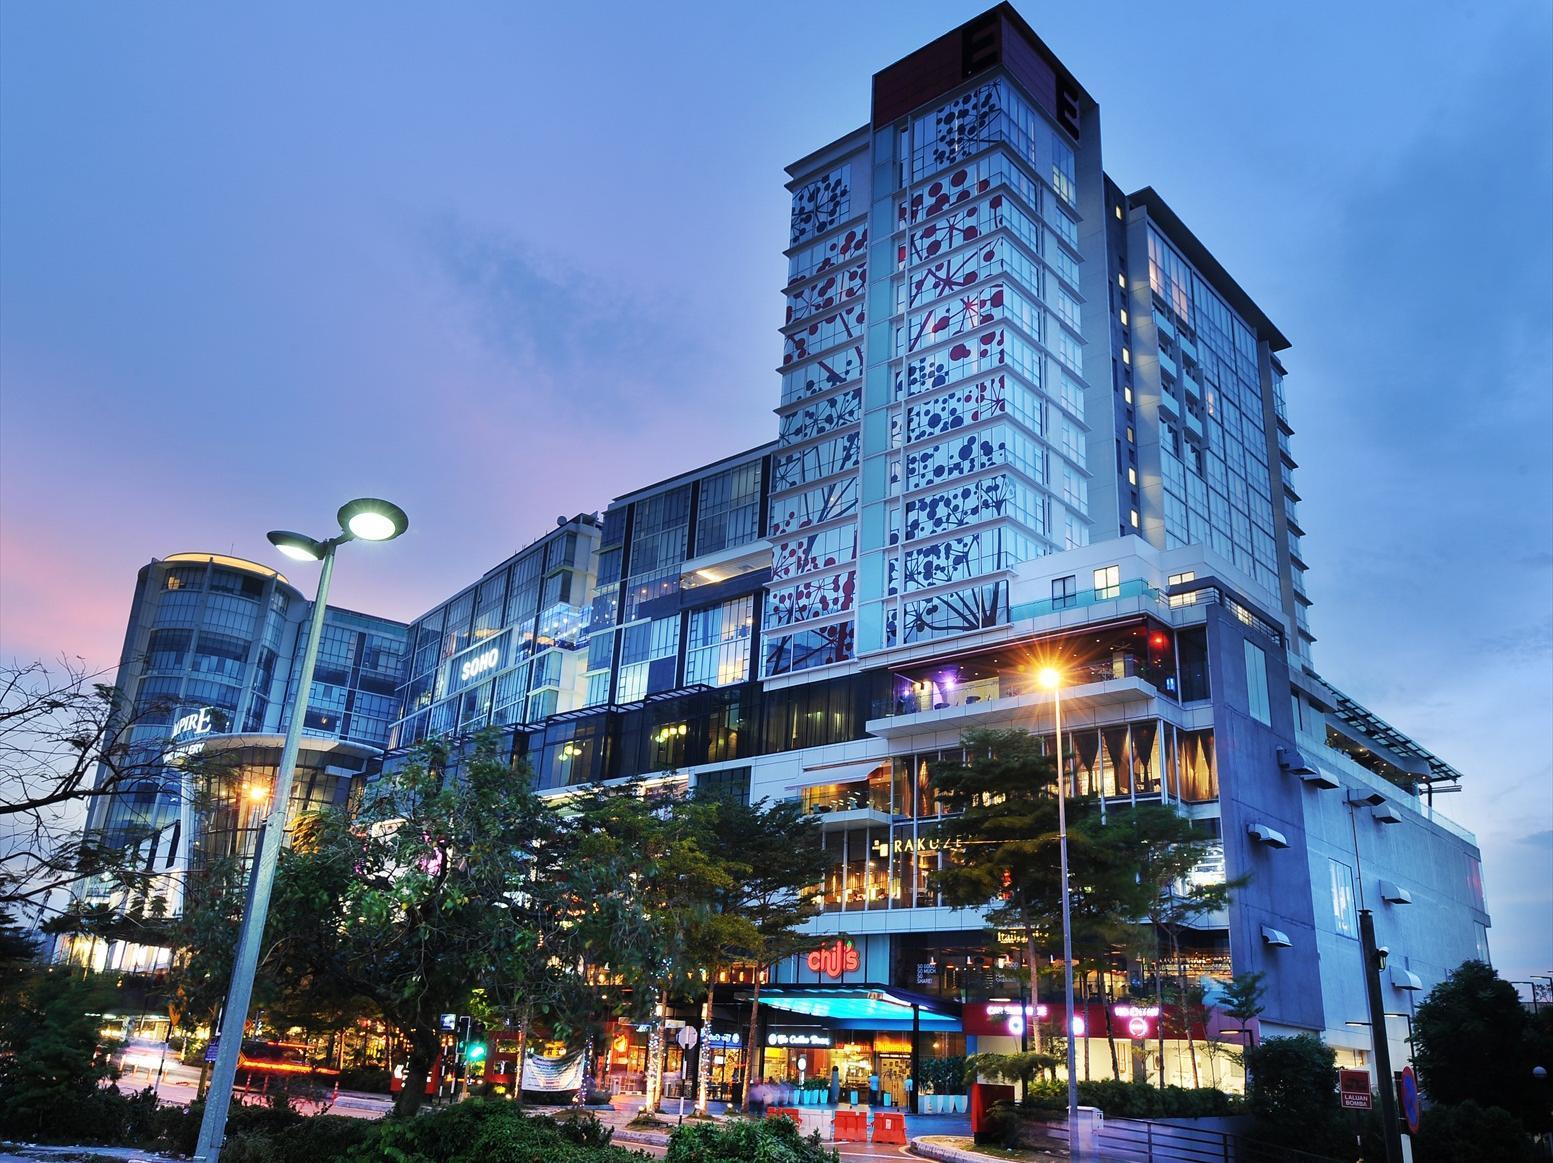 Staycation in Kuala Lumpur